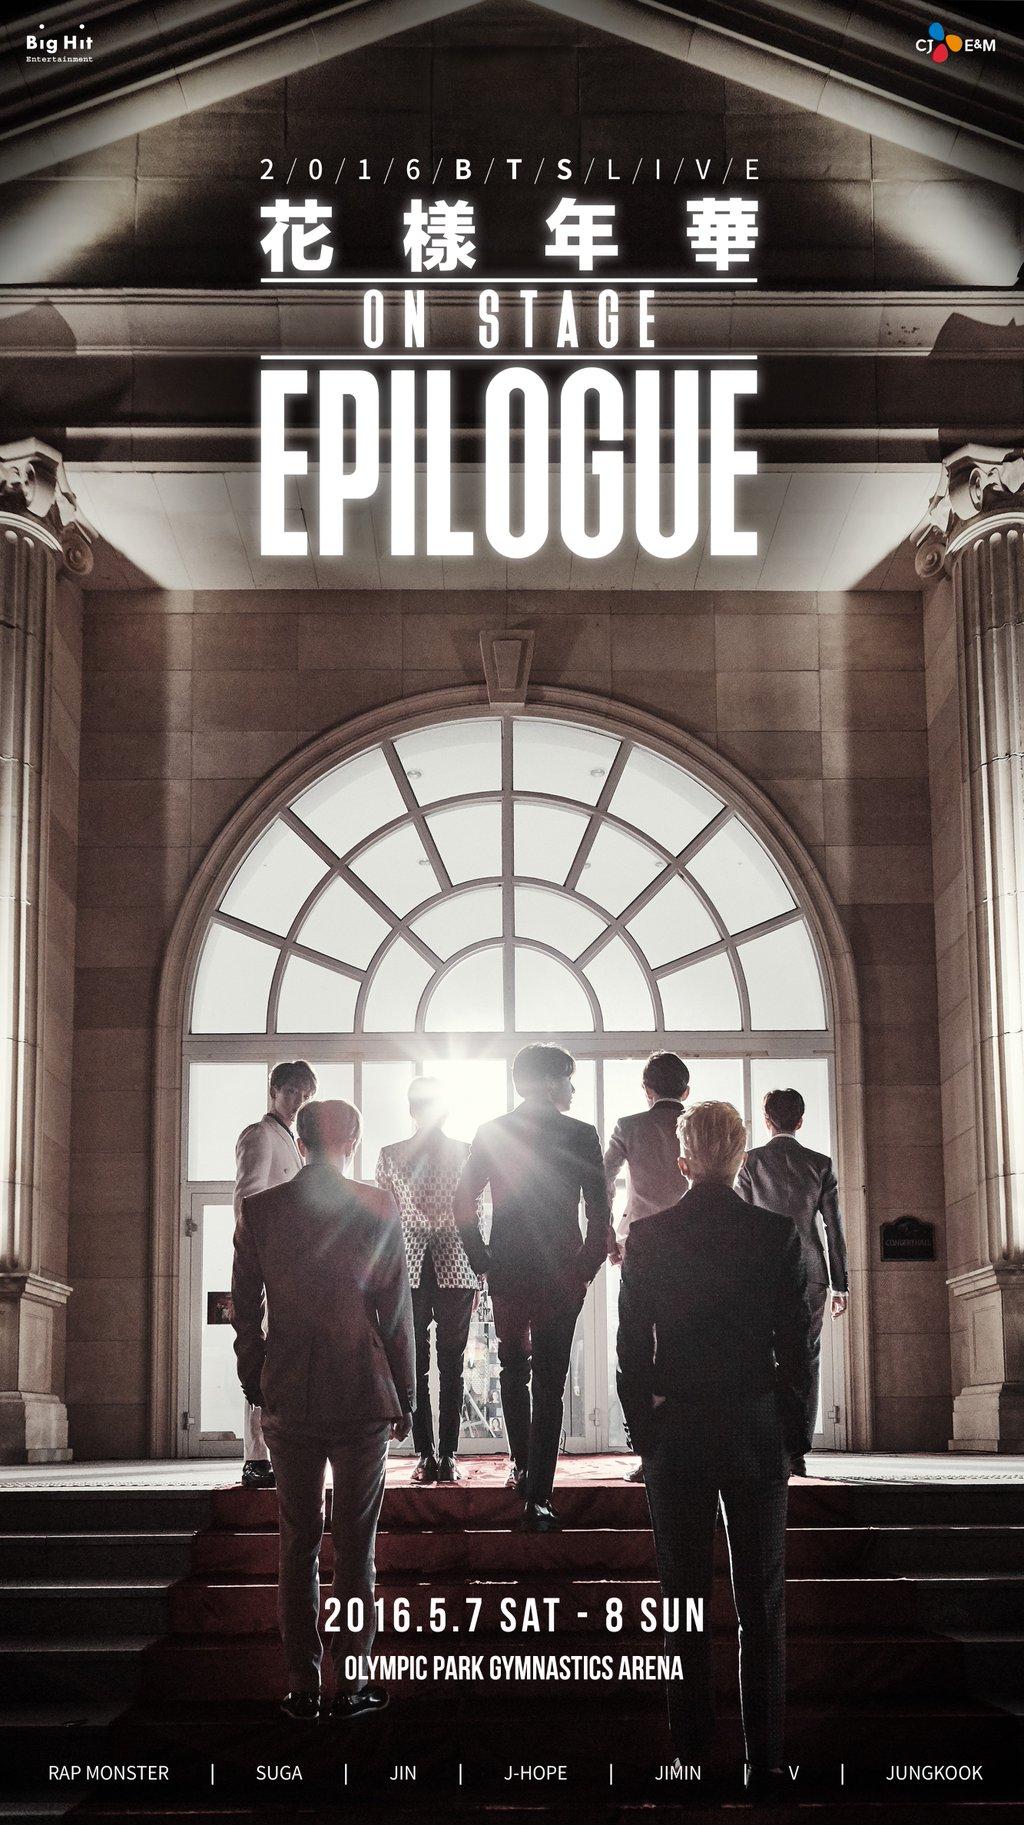 BTS Announces Release of Special Album and Plans for Epilogue Concert